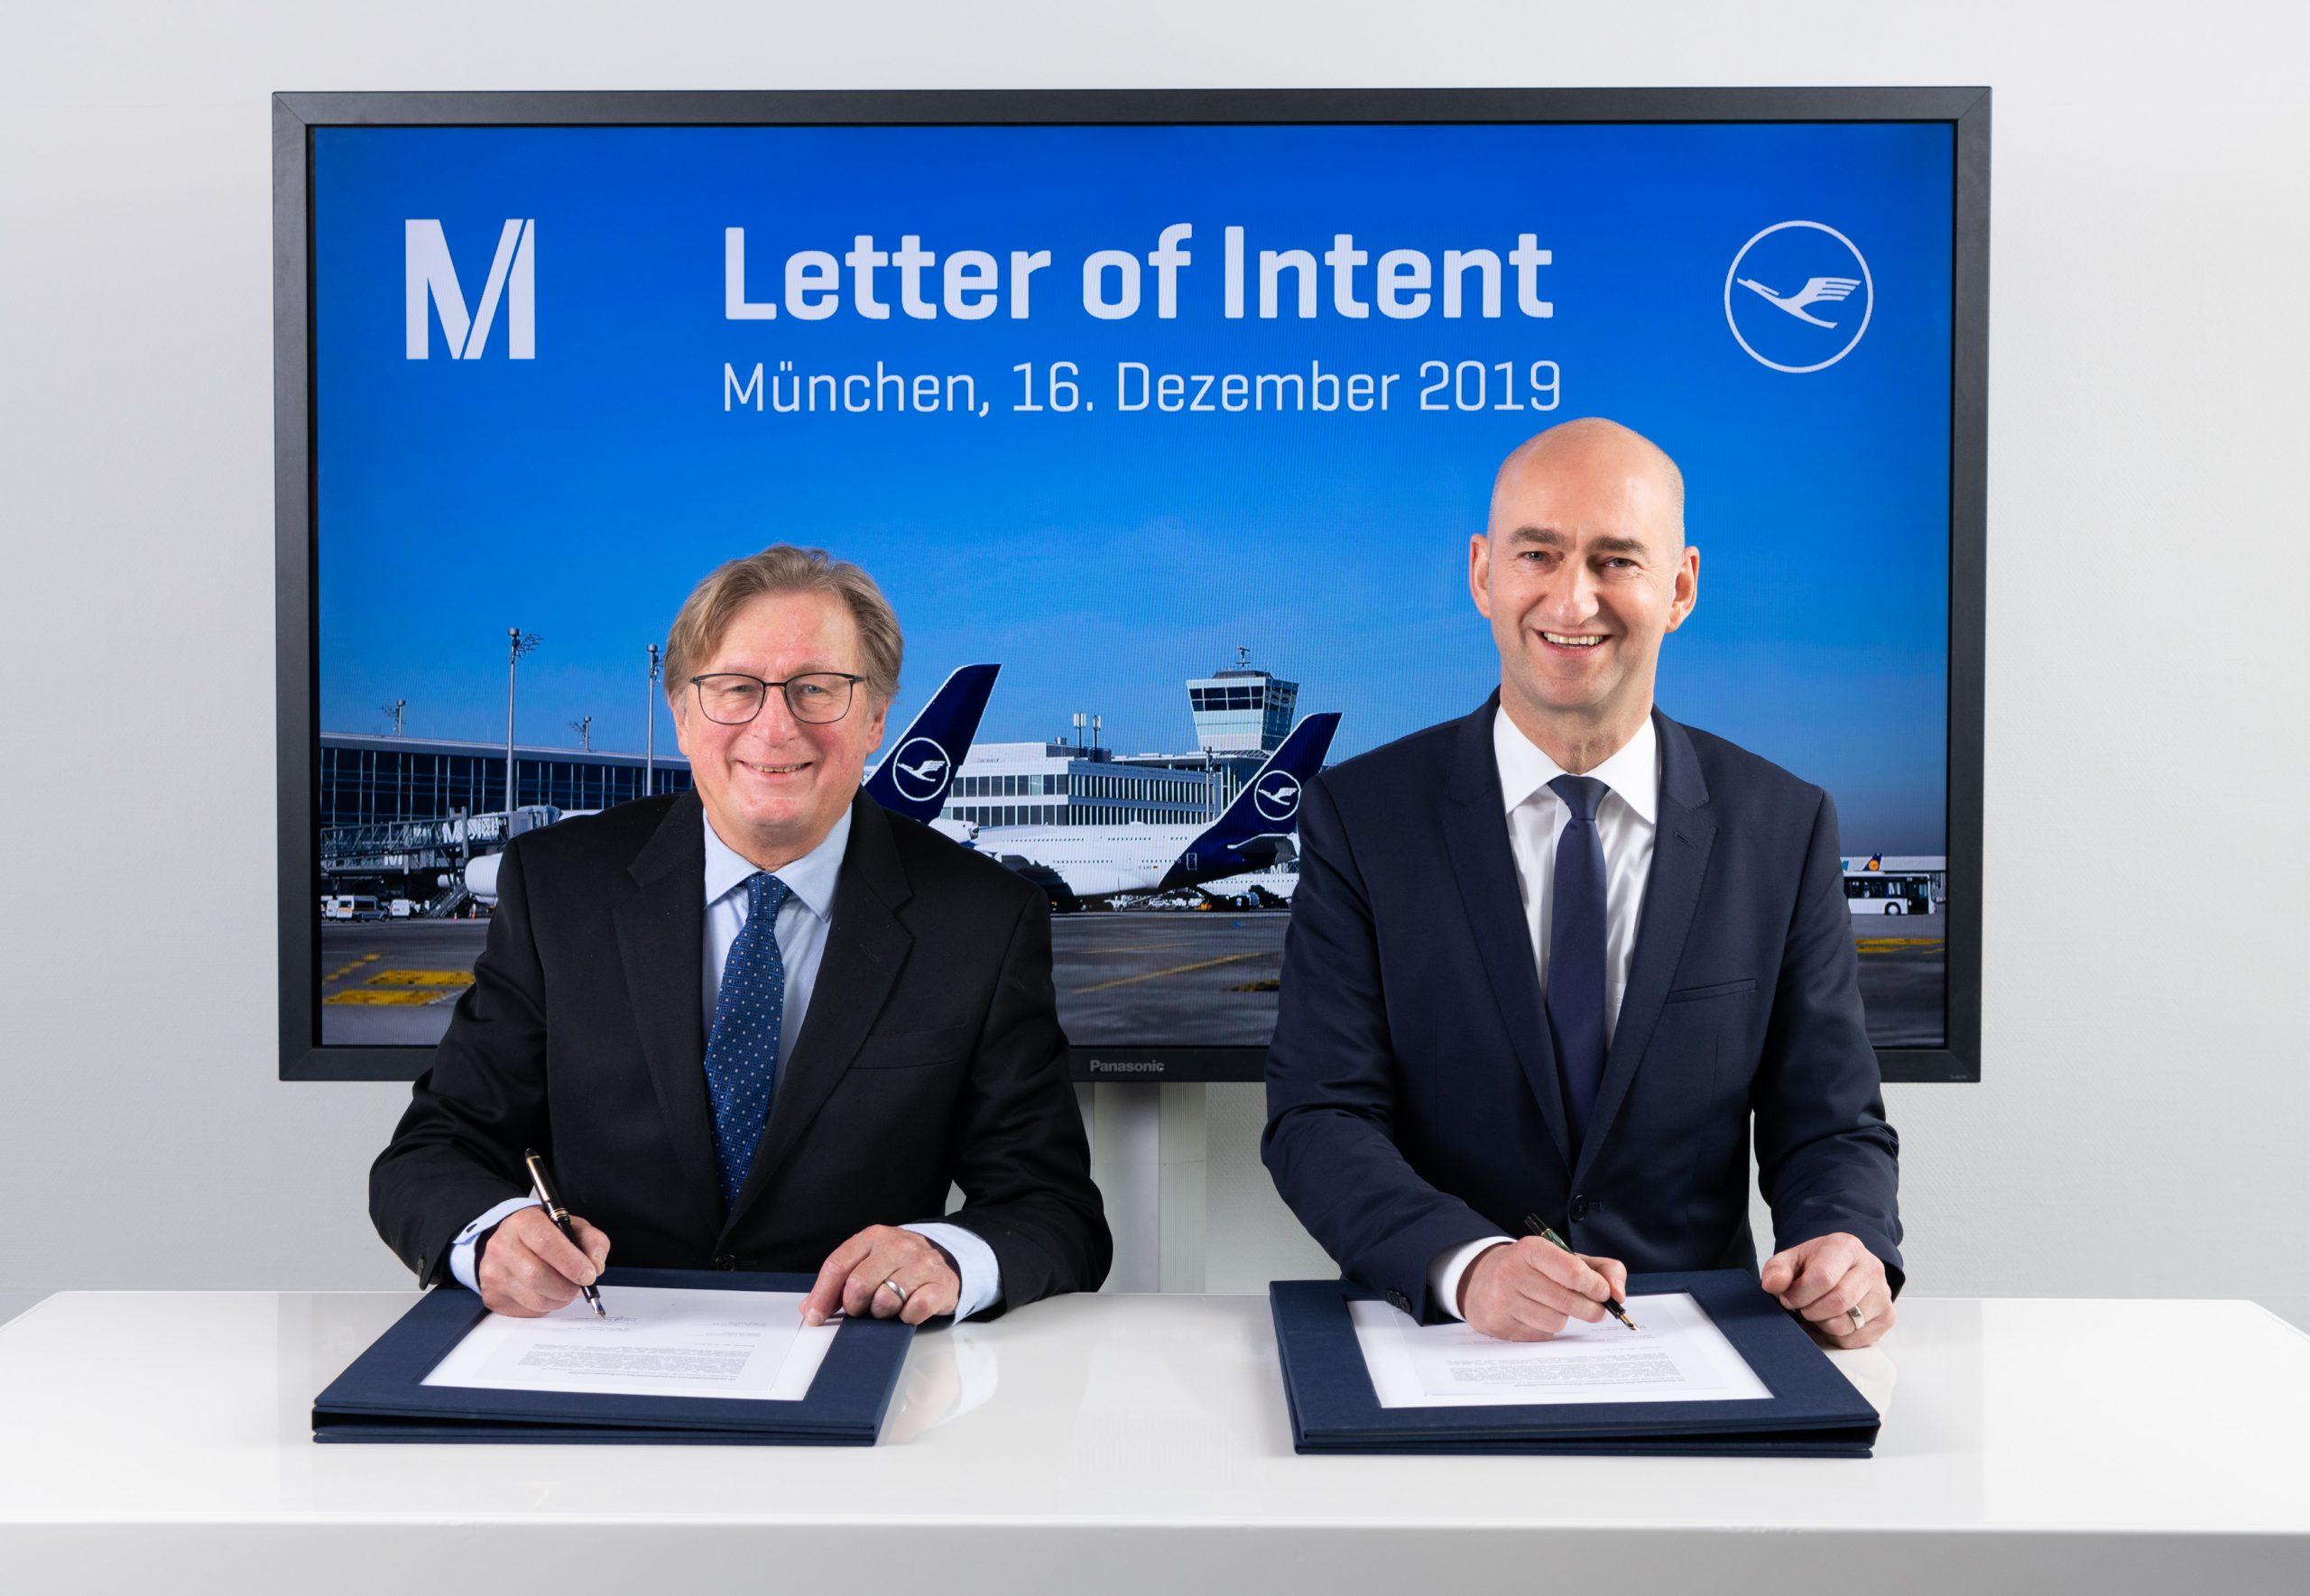 Michael Kerkloh (t.v.) bestyrelsesformand München Lufthavn og Wilken Bormann, direktør for Lufthansa Hub München underskriver intentionsaftalen. (Foto: Stephan Goerlich / FMG)